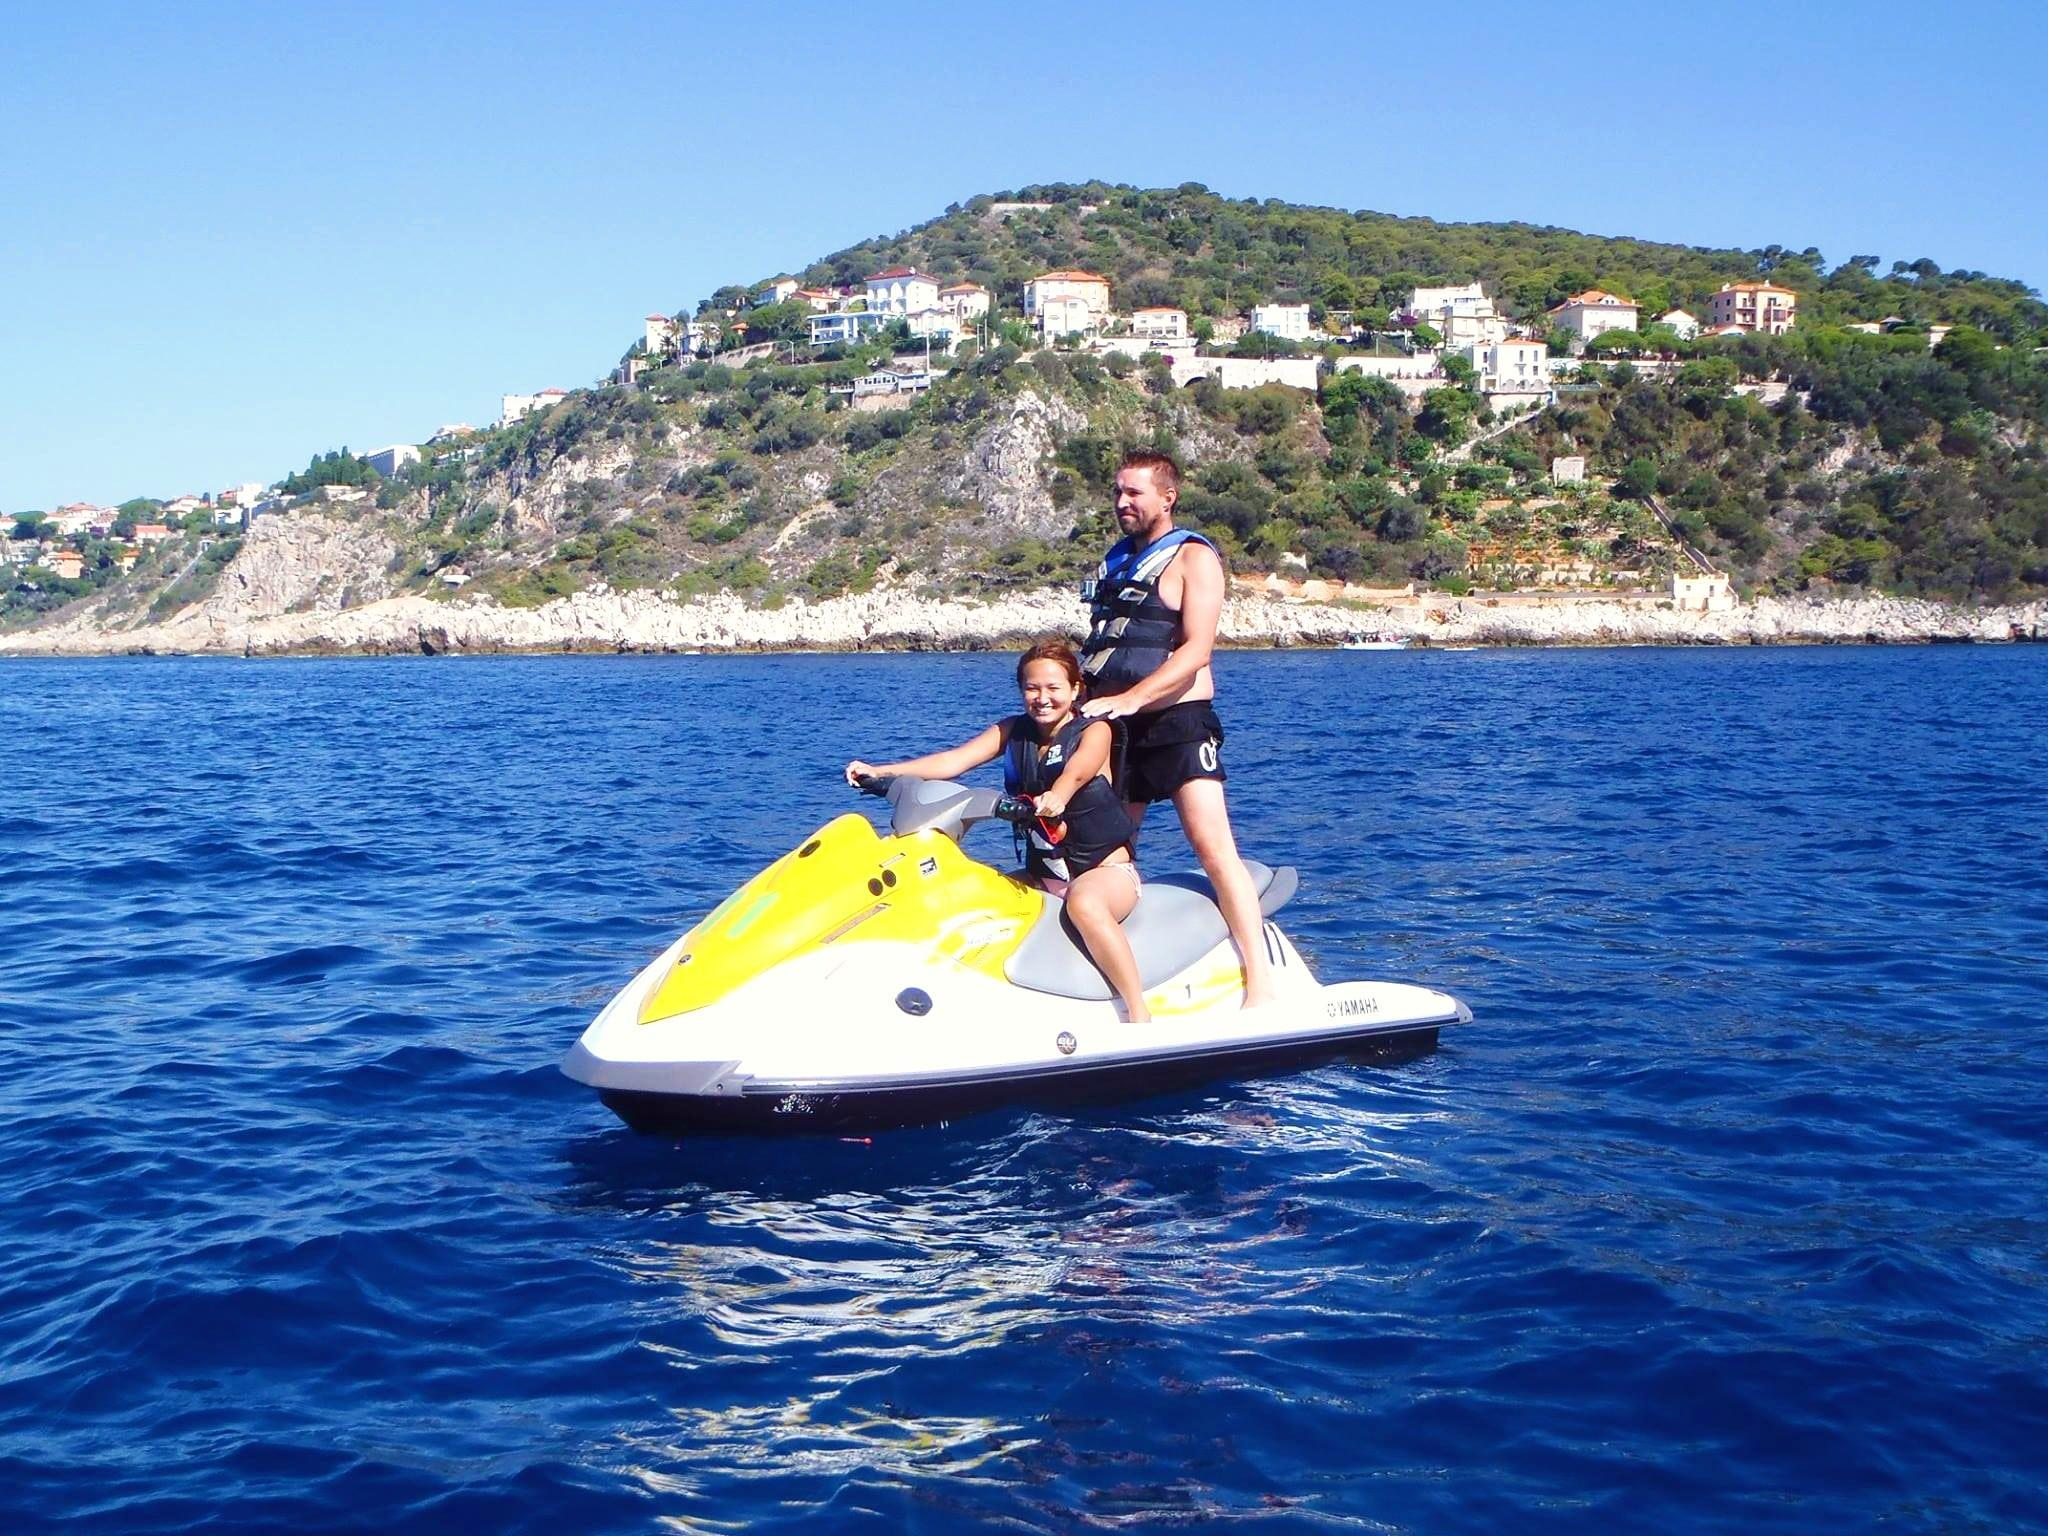 Jet Ski Safari near Antibes